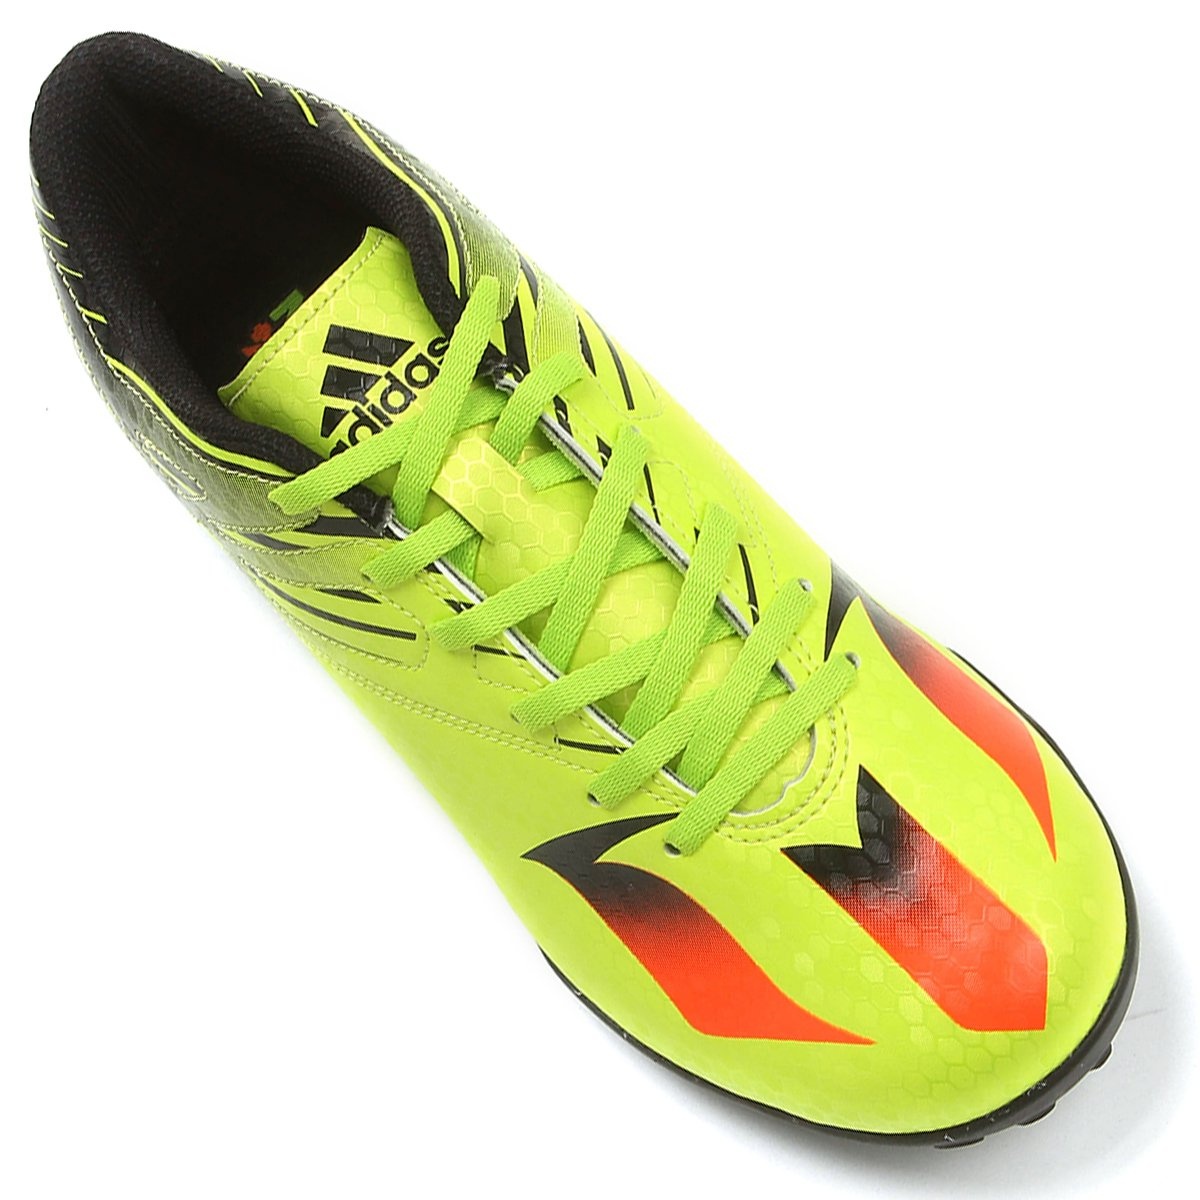 Verde Chuteira 15 Messi Limão e TF Masculina 4 Adidas Society Laranja aW1S0Tna